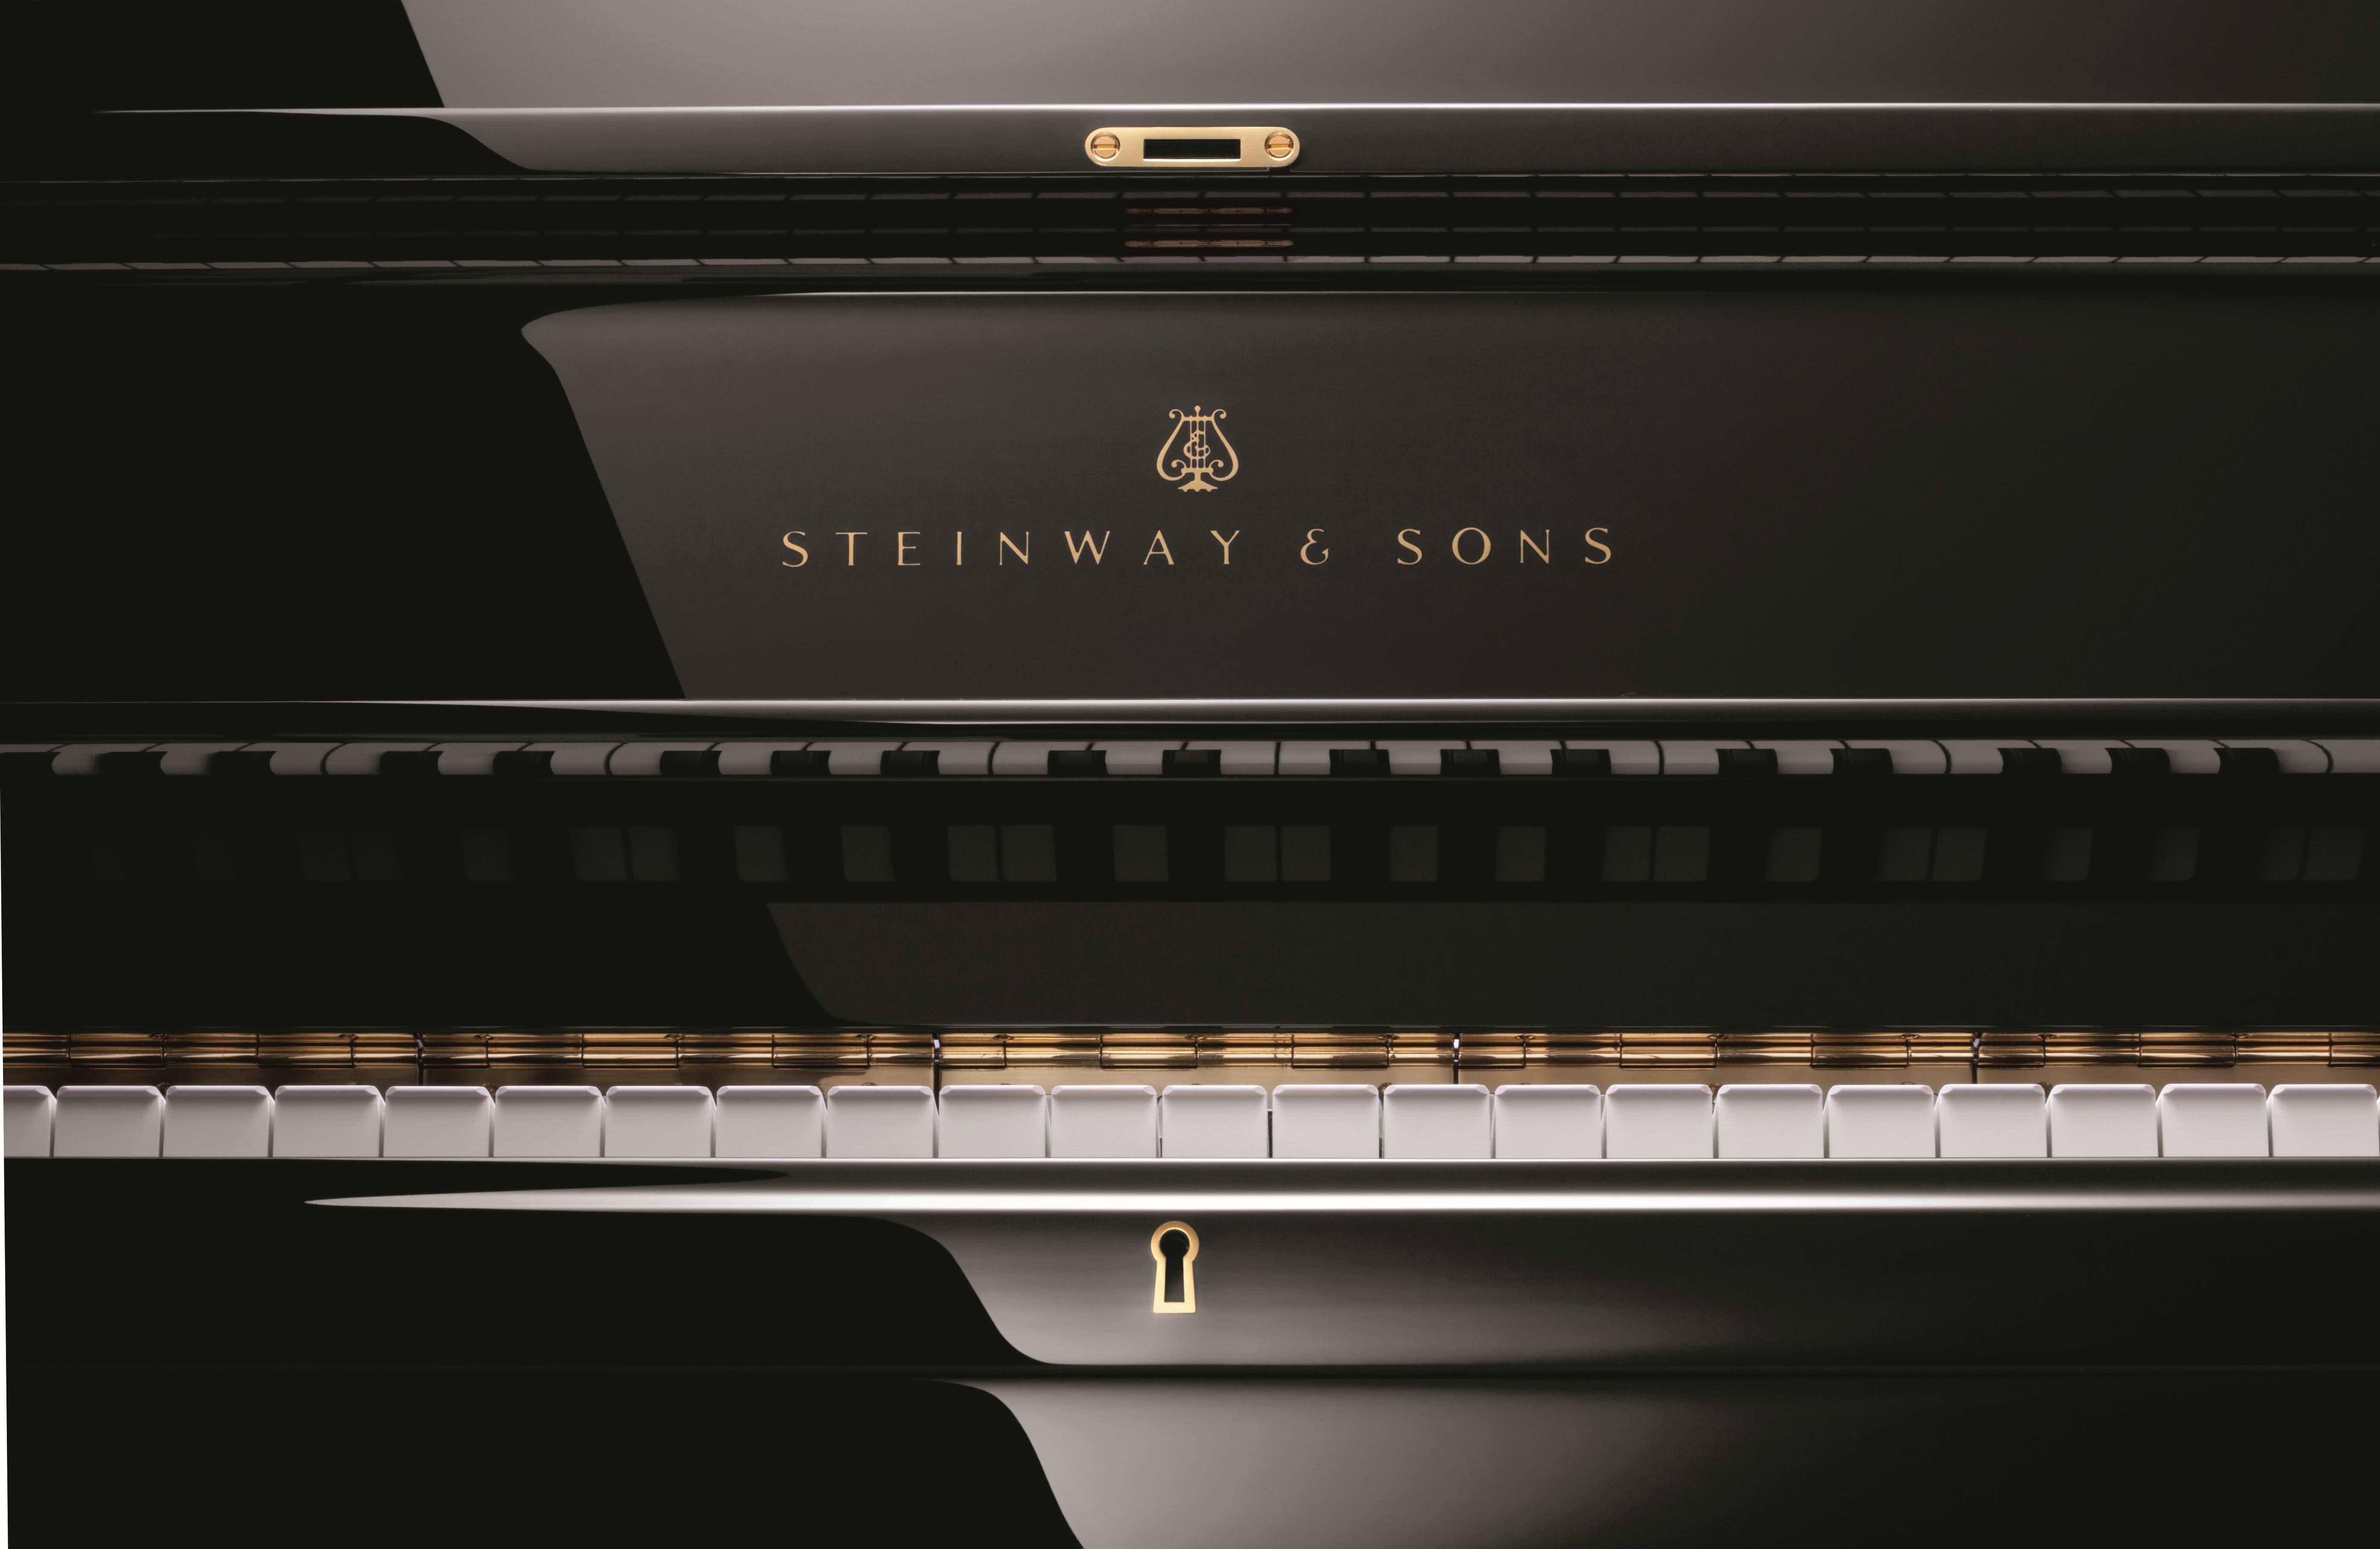 Жемчужины Steinway & Sons